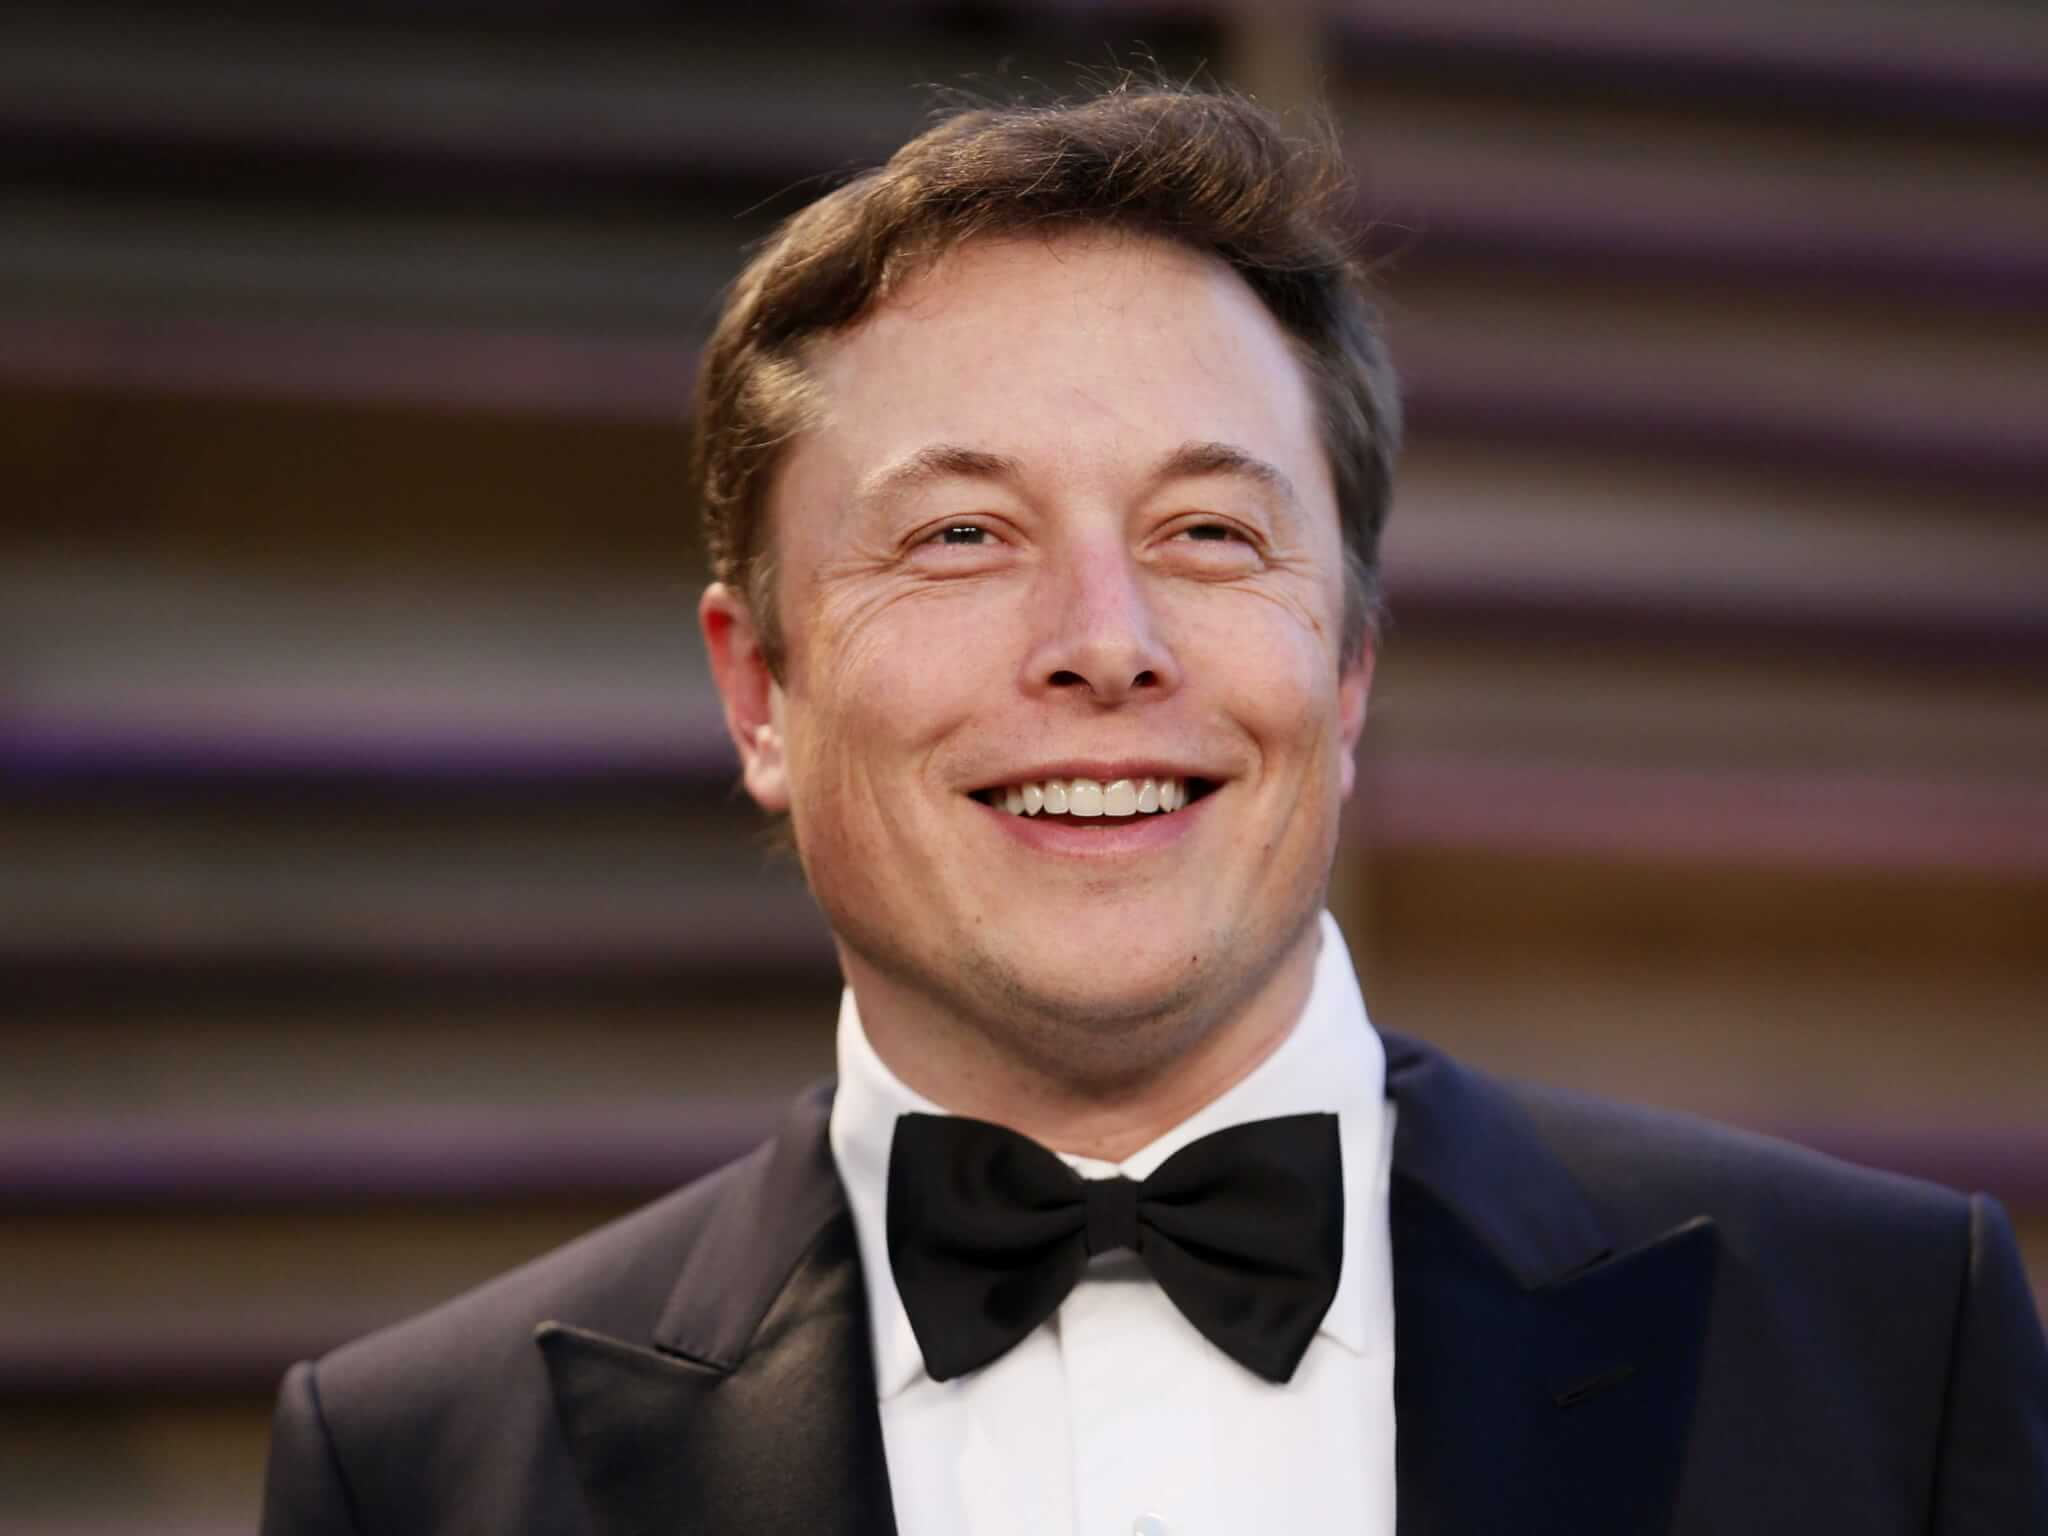 Elonk-Musk